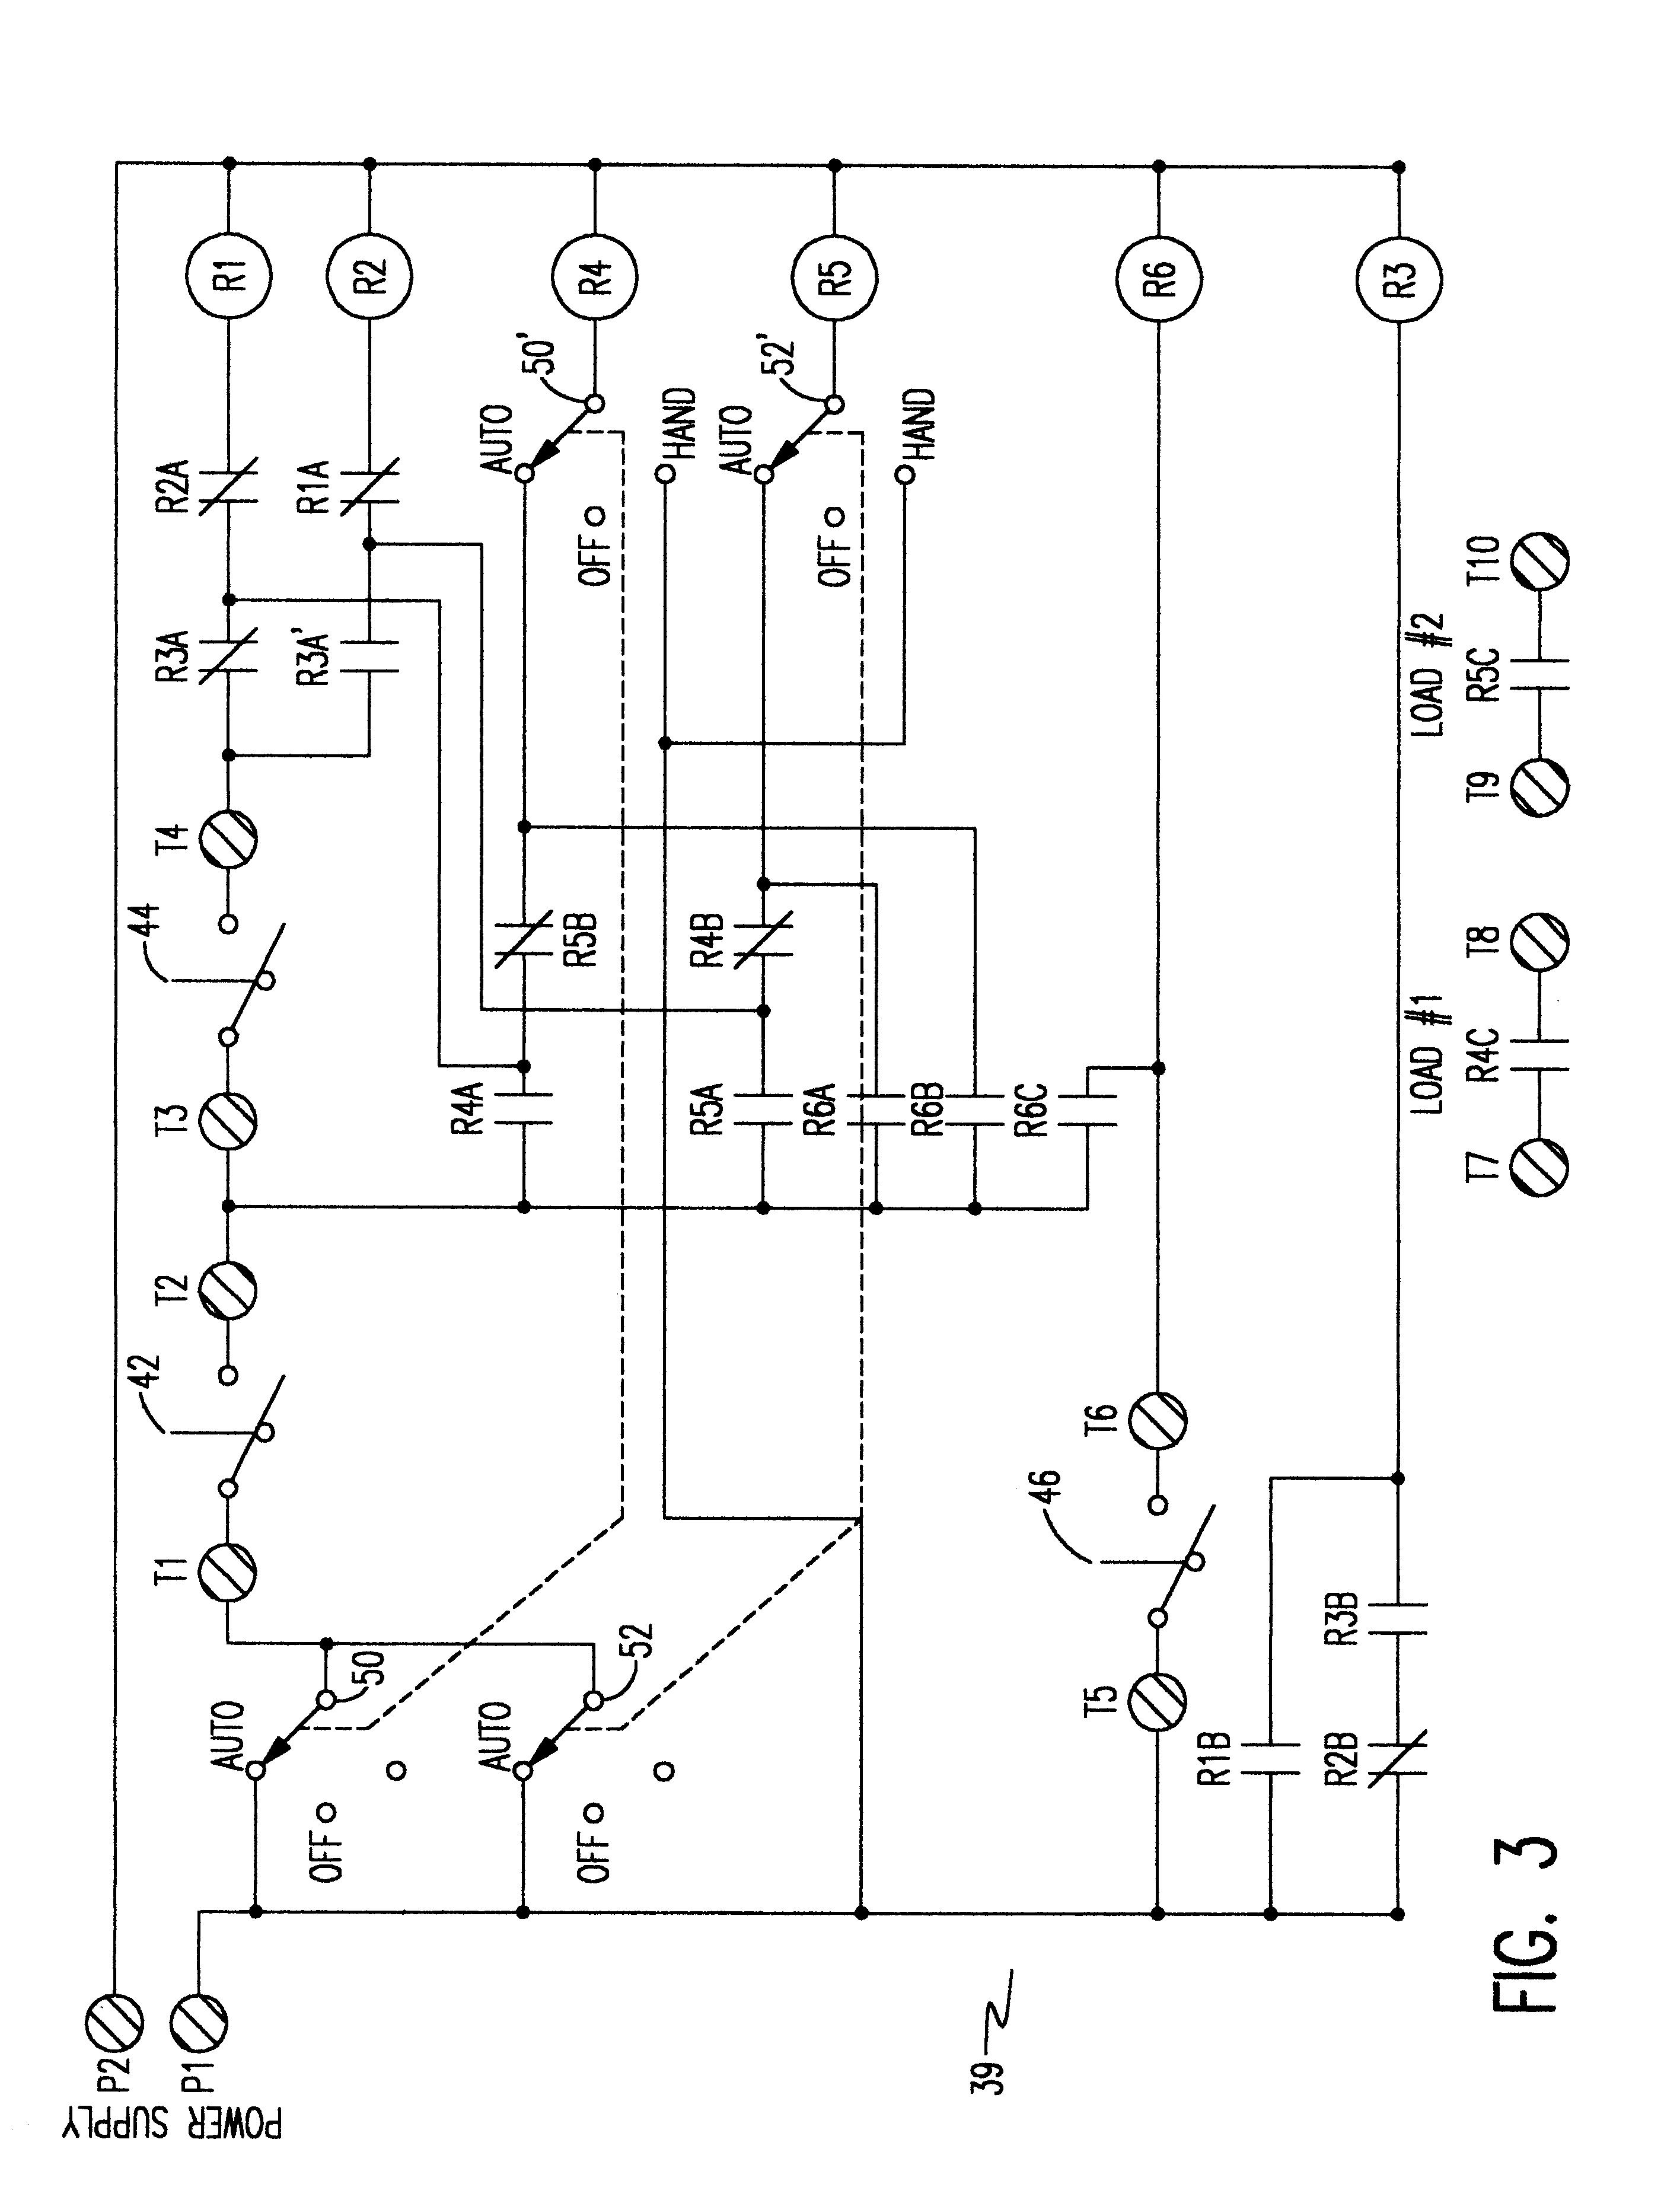 Lead Lag Pump Control Wiring Diagram Automotive Ab Alternating Relay 36 Spdt